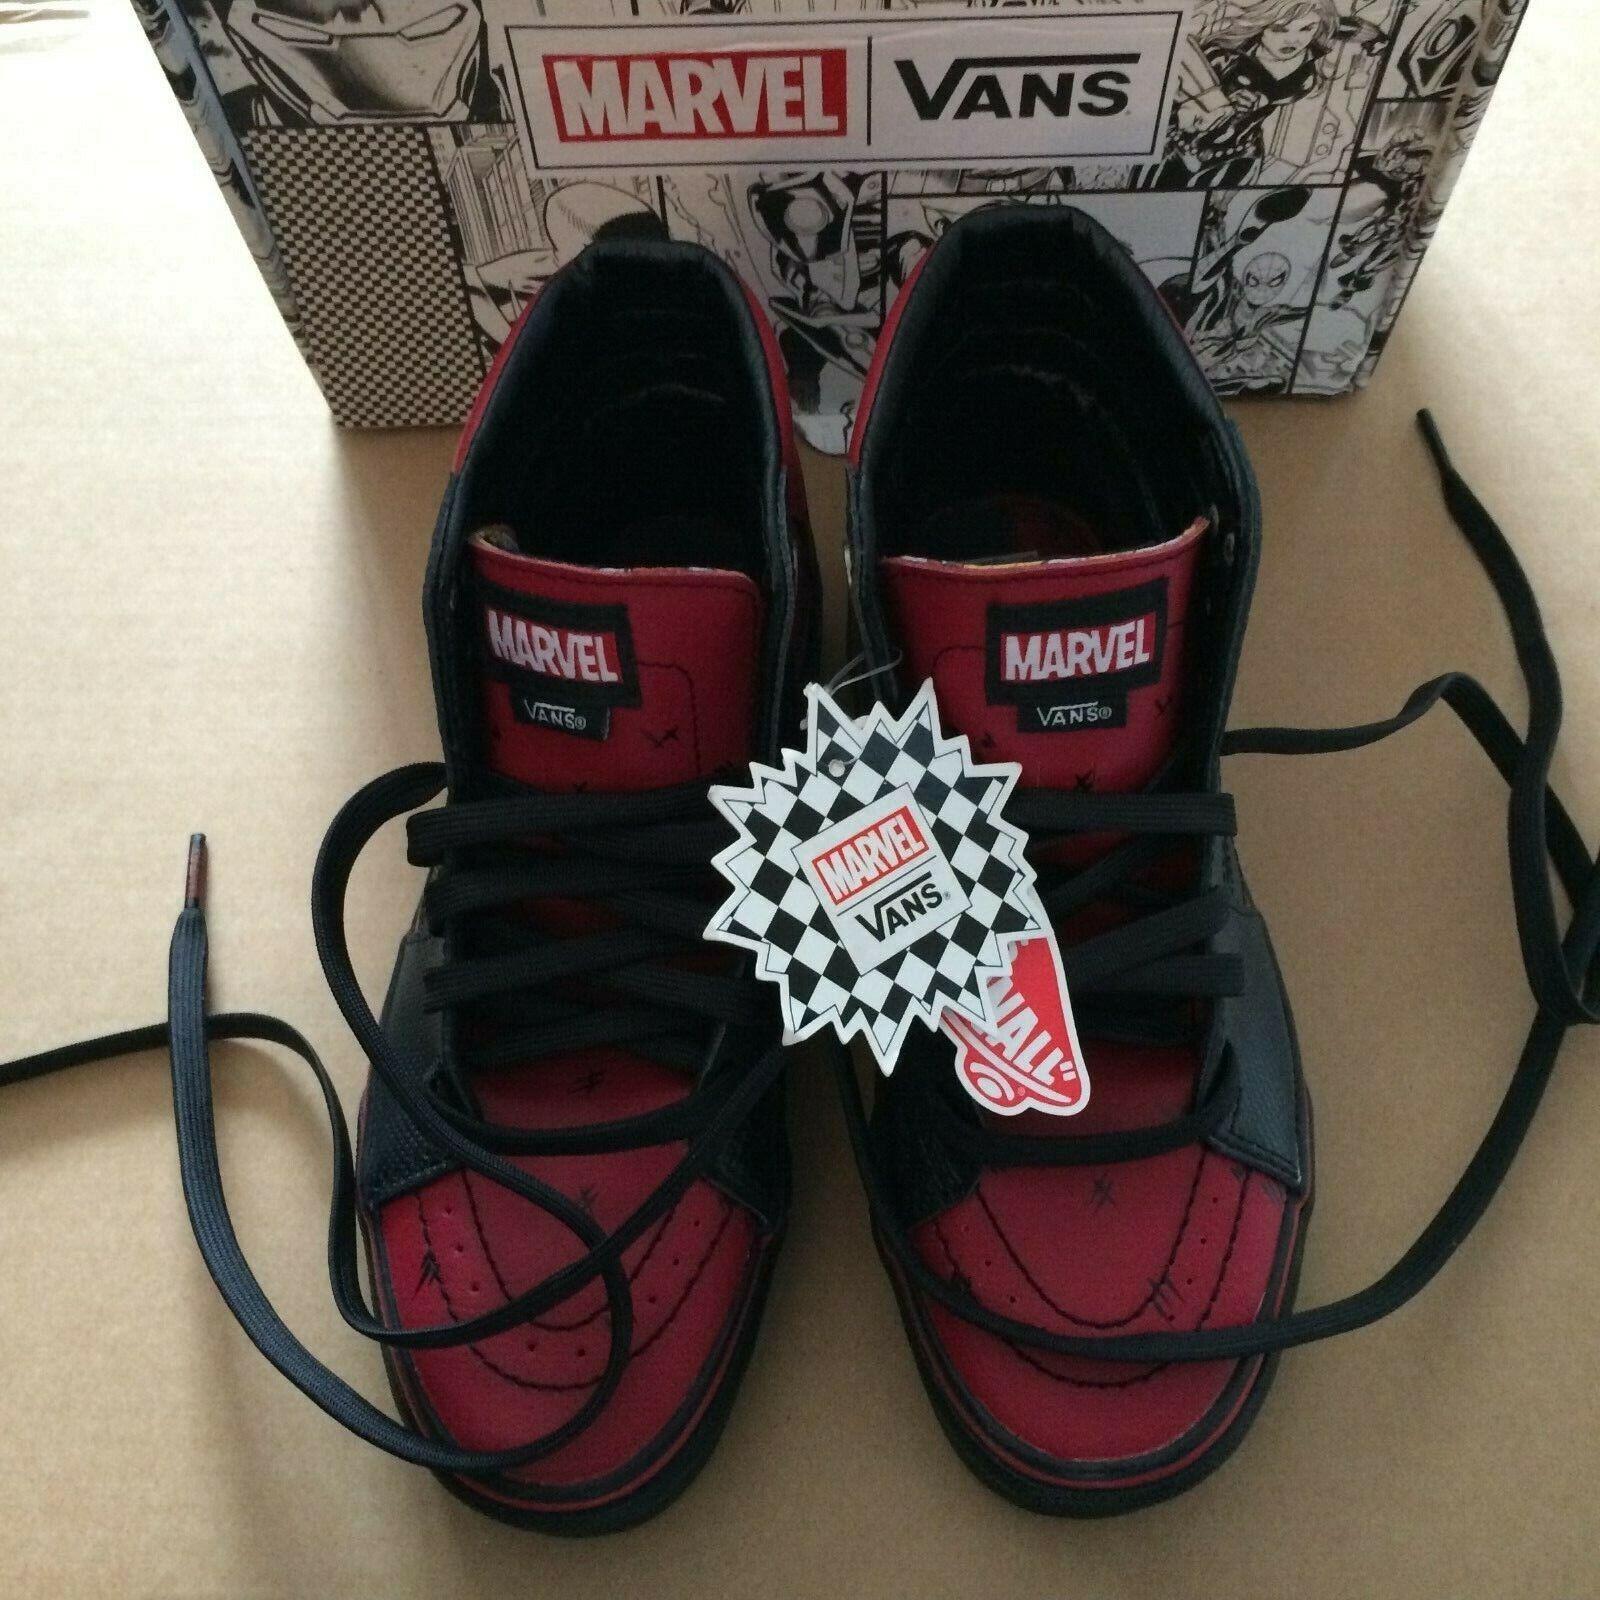 Vans Off The Wall Unisex Marvel shoes - - - Deadpool Black (Size  US Men 4.0 Wn 5.5) 1e47ef